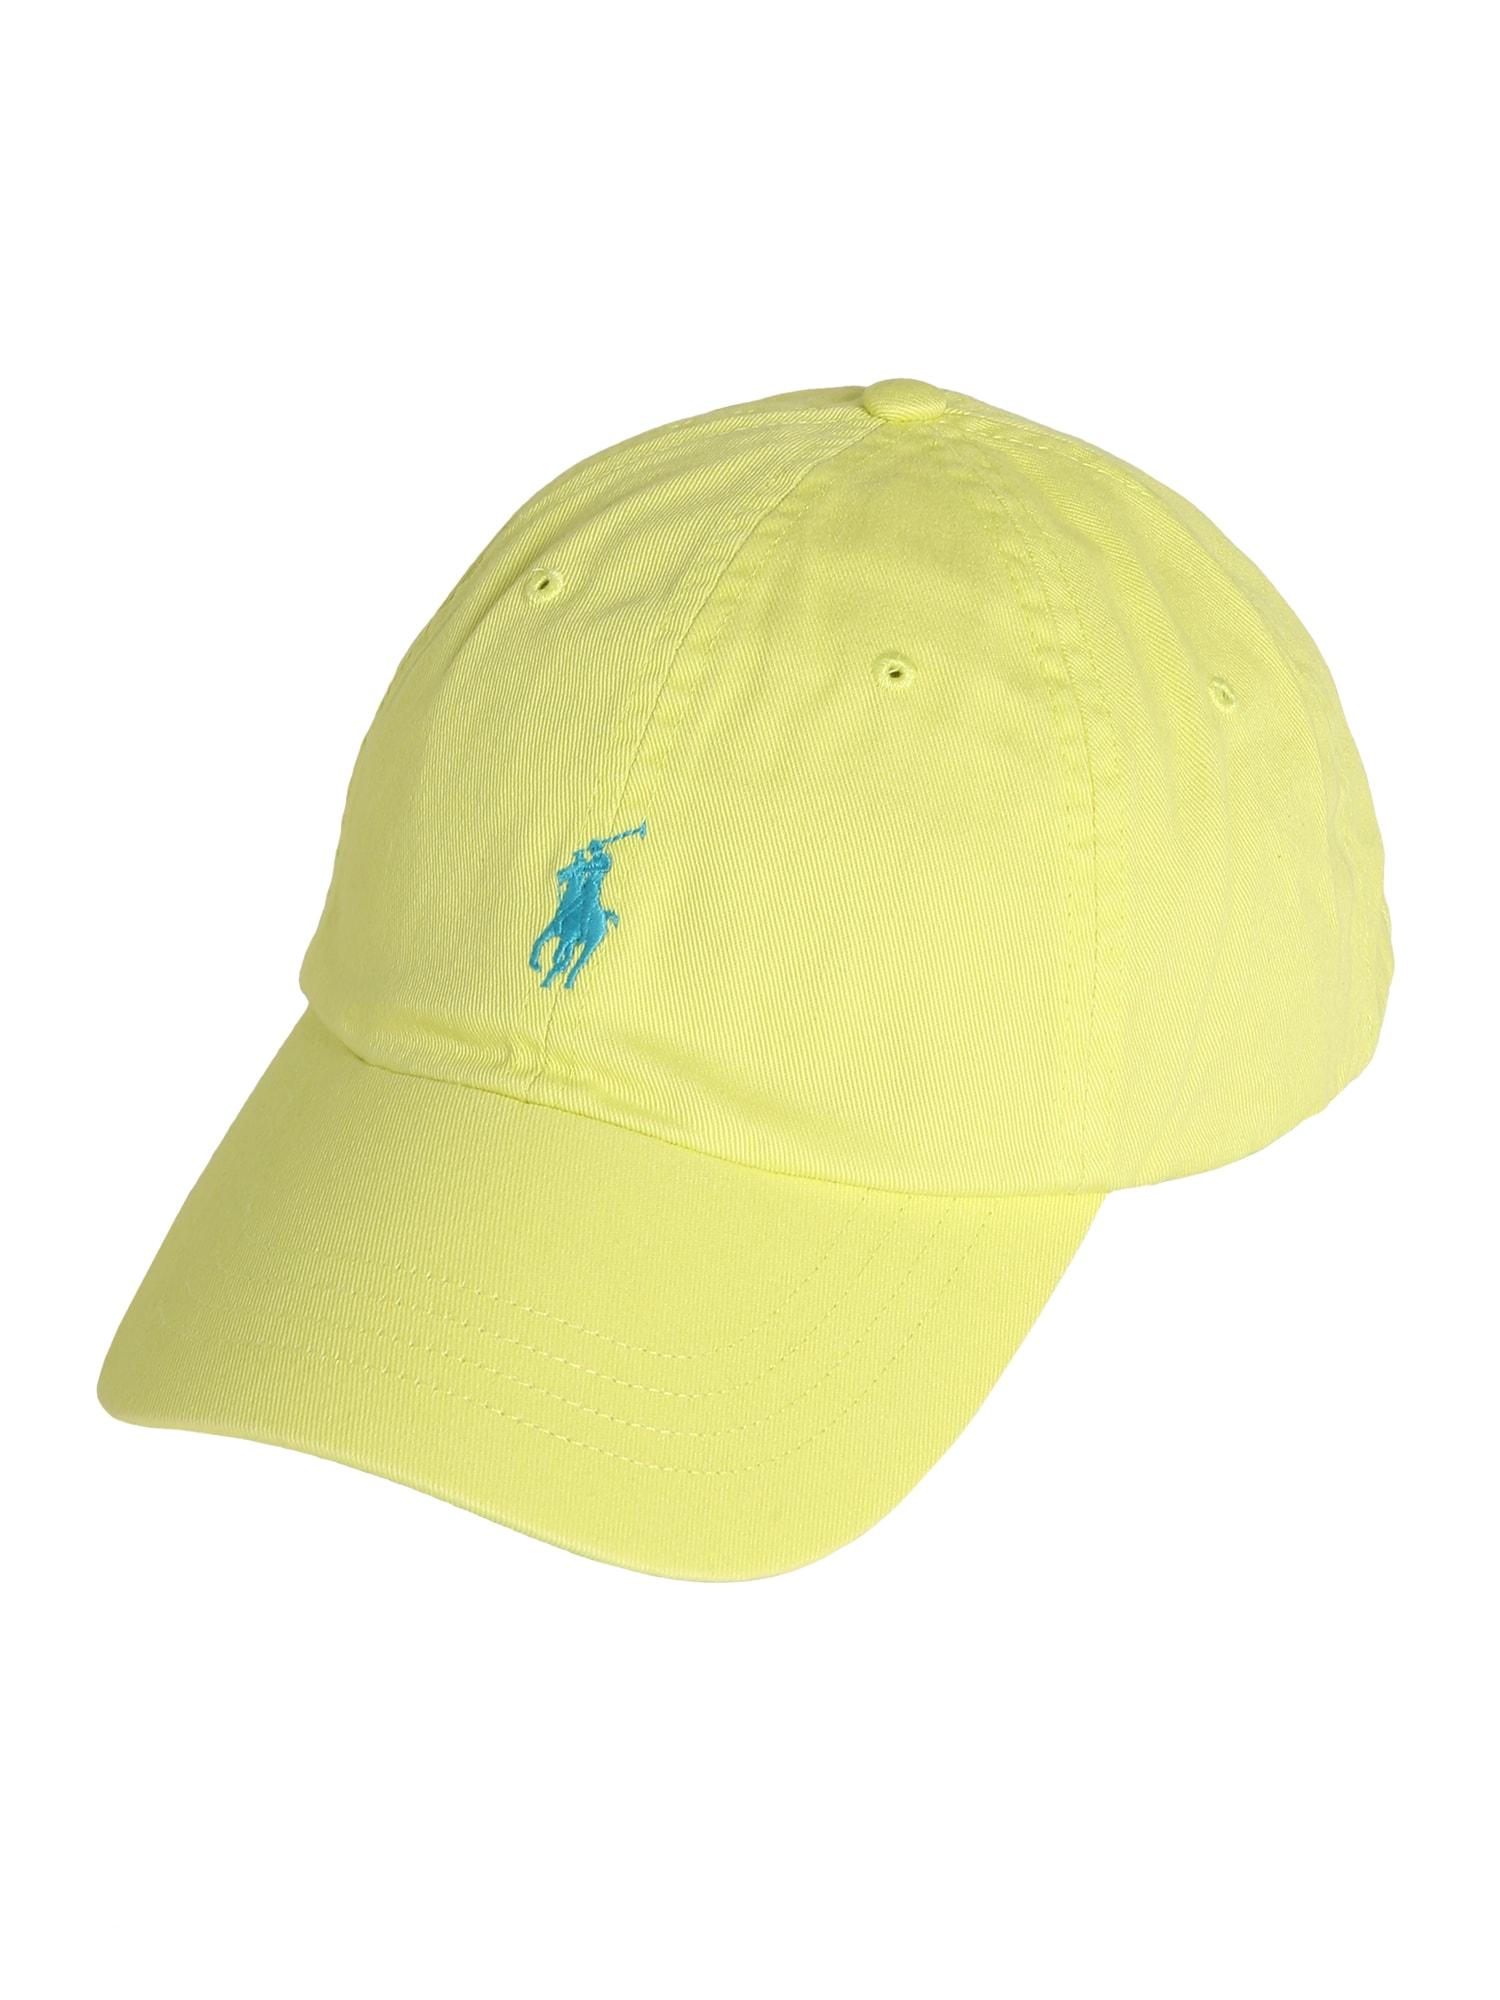 POLO RALPH LAUREN Kepurė neoninė geltona